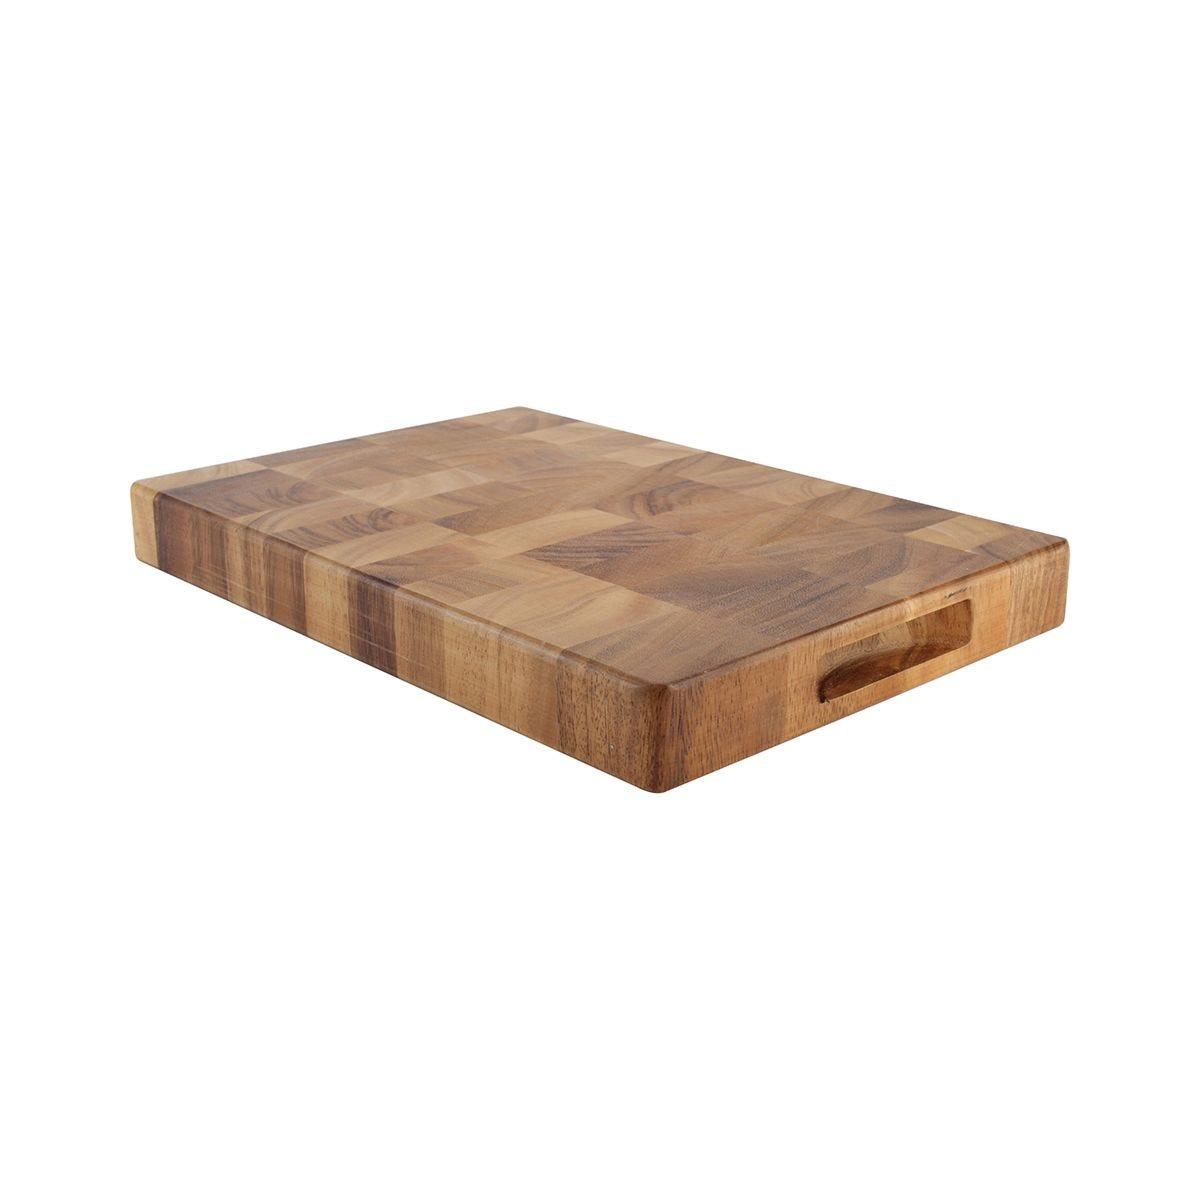 T&G Rectangular Chopping and Serving Board  - Medium